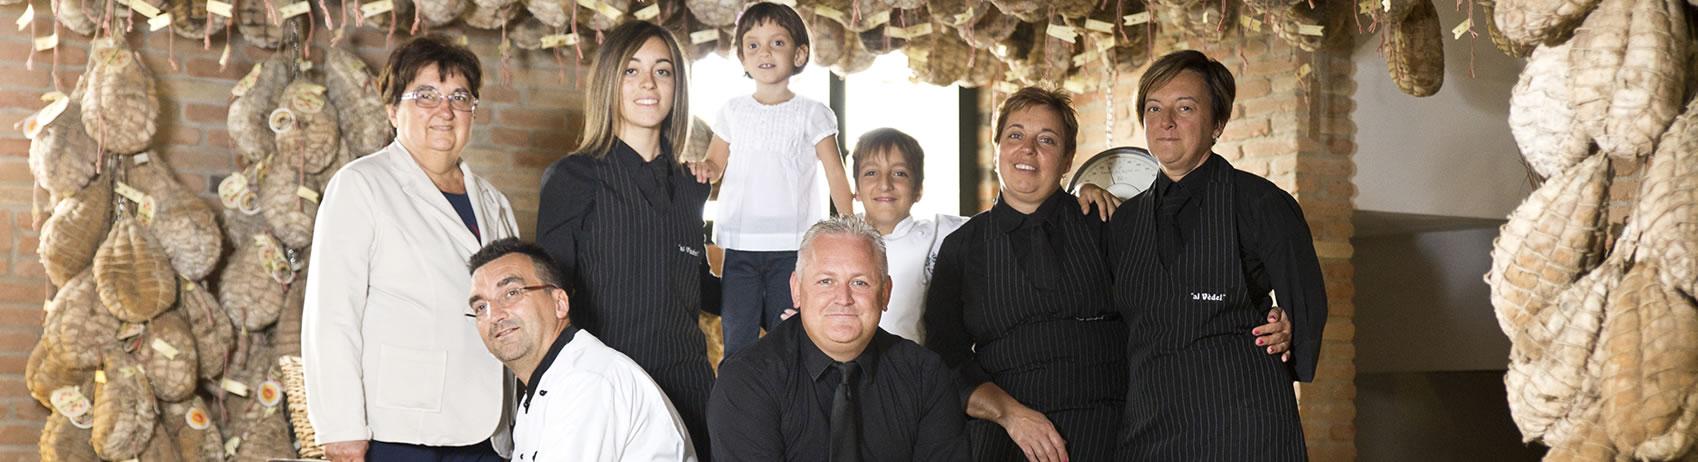 slide_podere_cadassa_famiglia